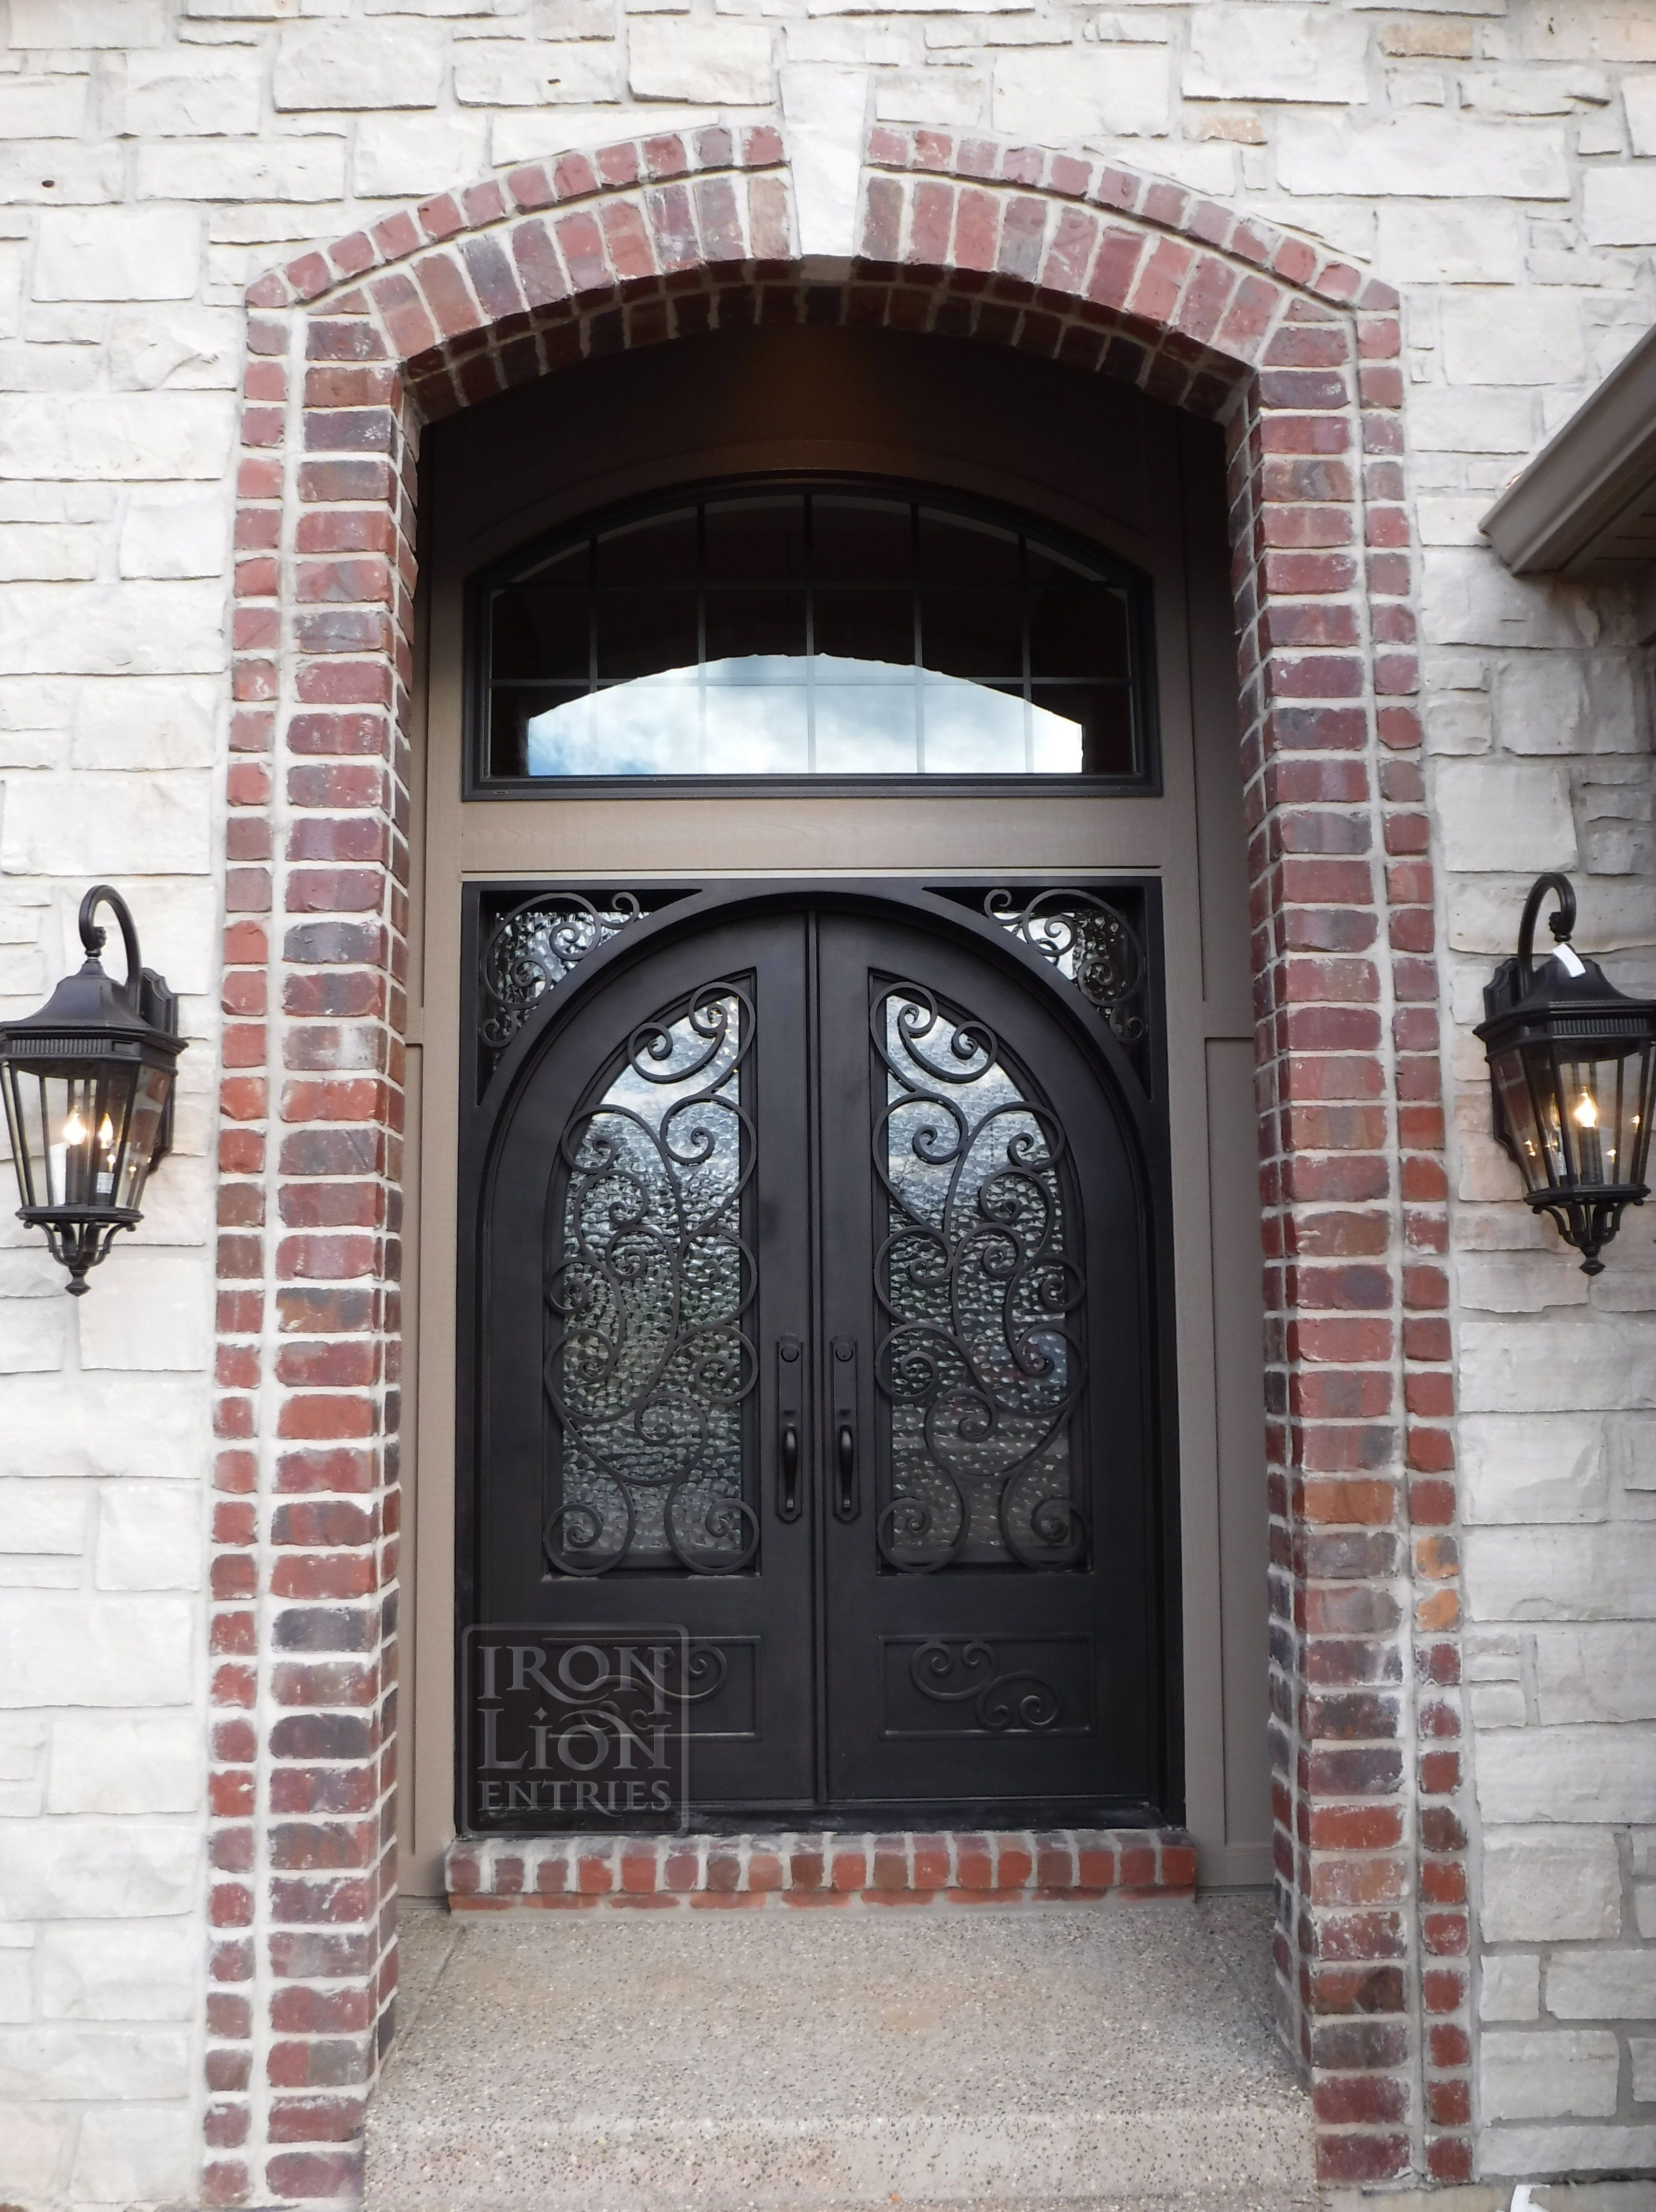 Iron Lion Entries Custom Arch In Square Iron Door Custom Iron